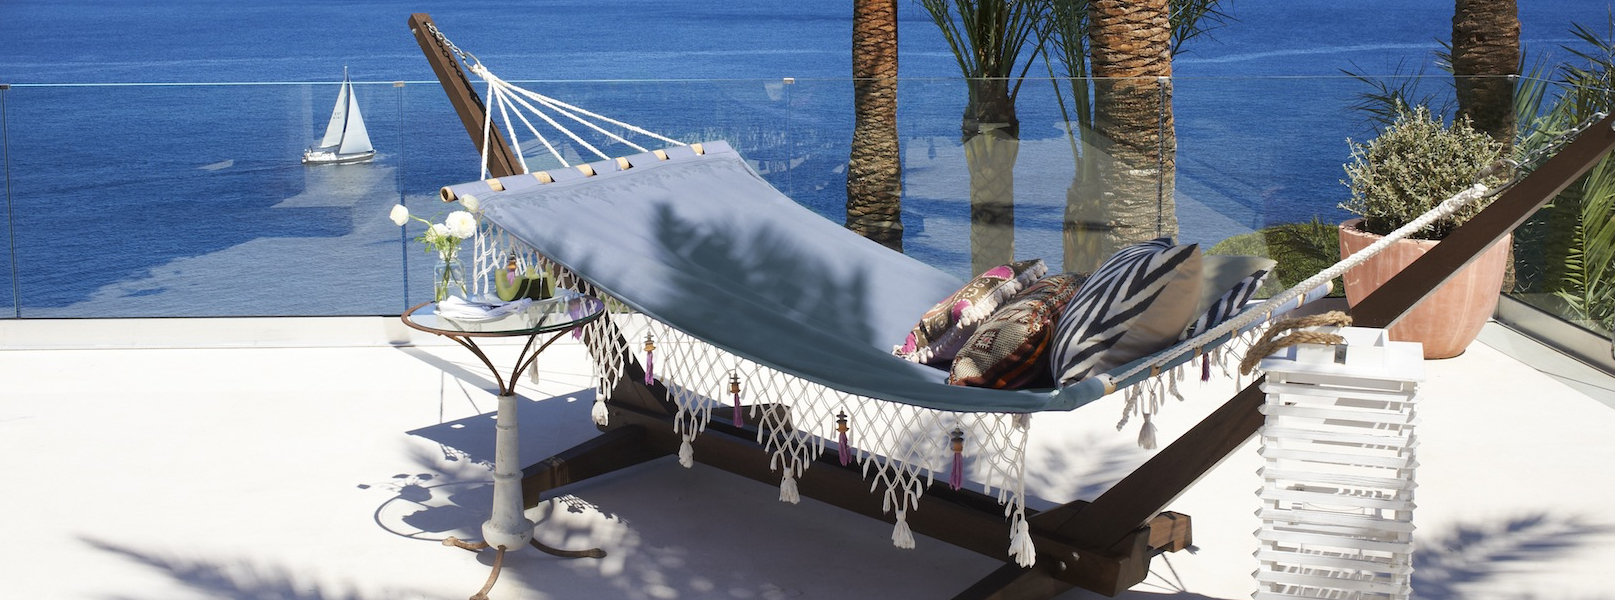 Exclusive-rental-collection-Ibiza-hamaca